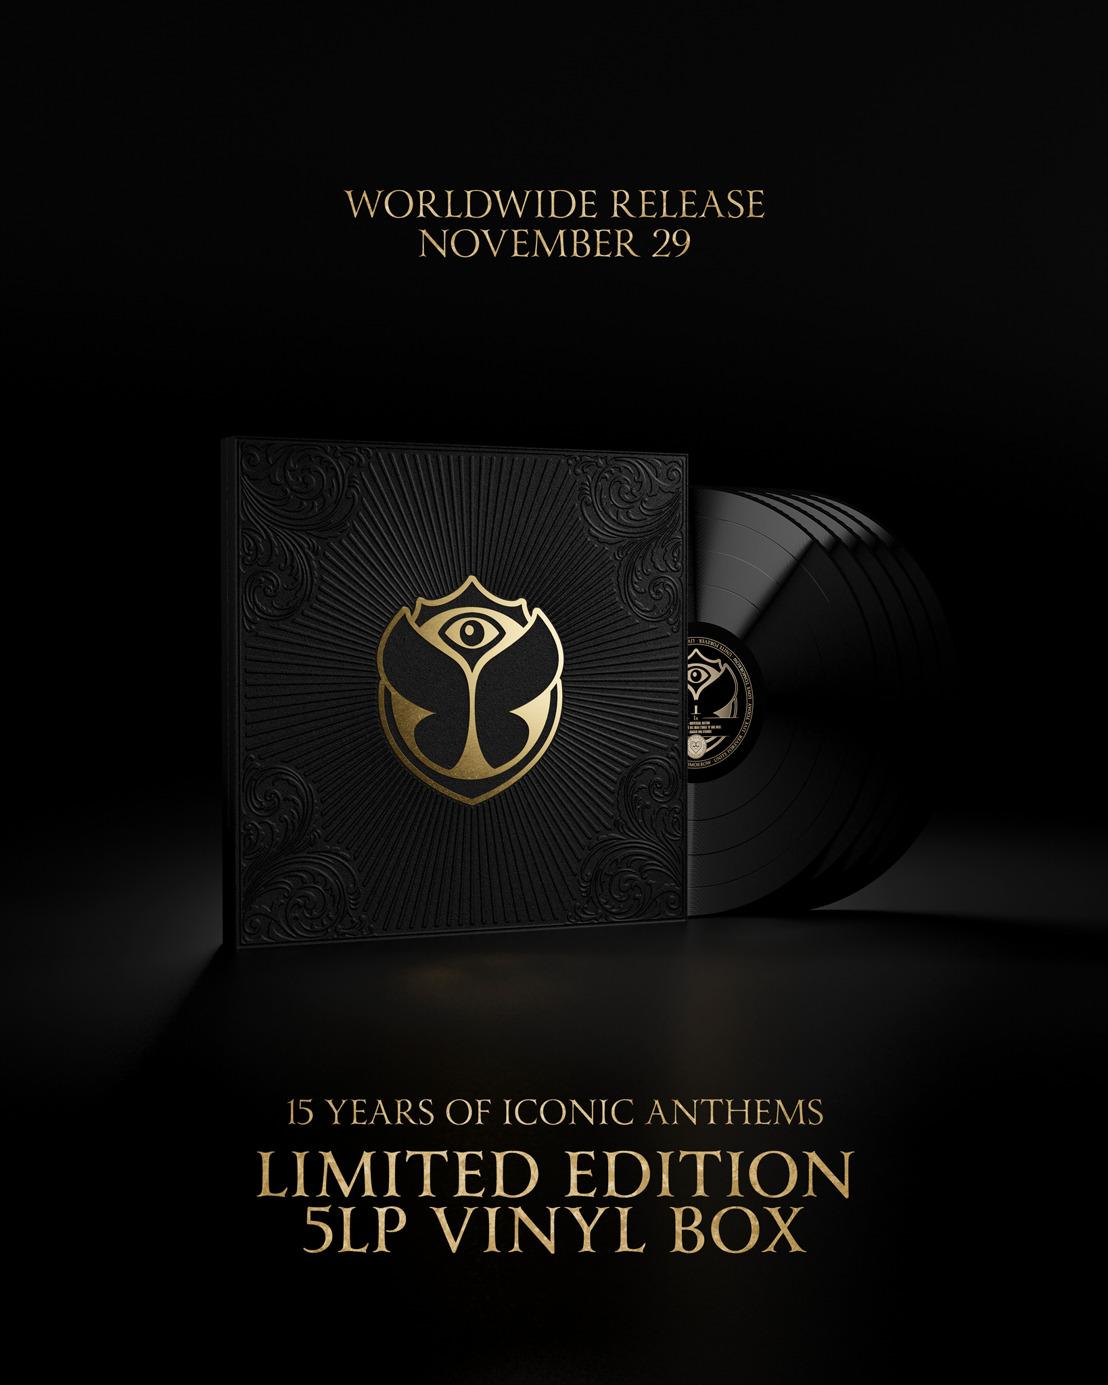 Tomorrowland XV Vinyl (5LP) – Het beste uit 15 jaar Tomorrowland